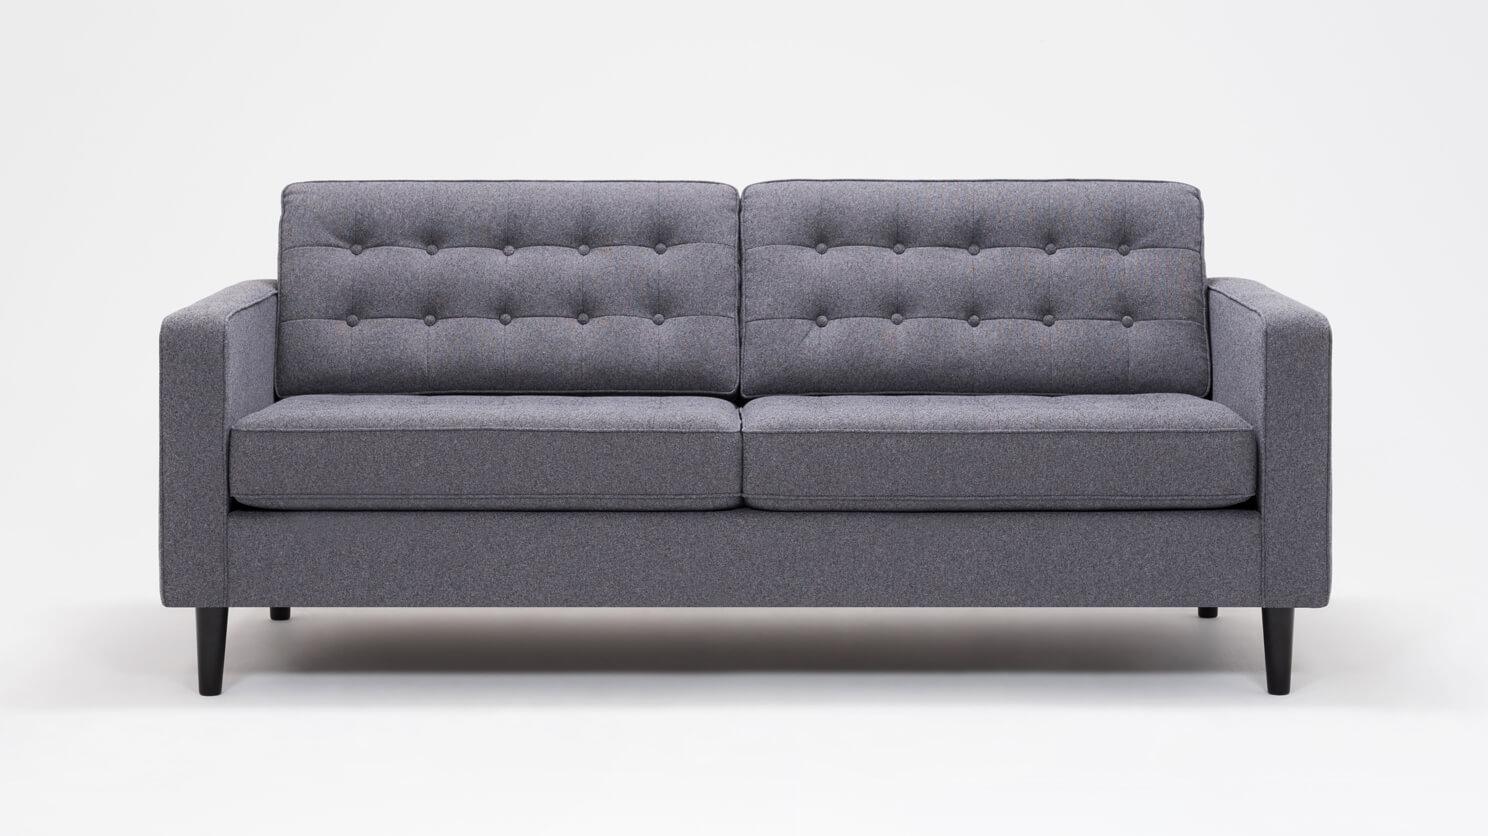 30095 91 1 apartment sofas reverie apartment sofa jet ash front 02.jpg2